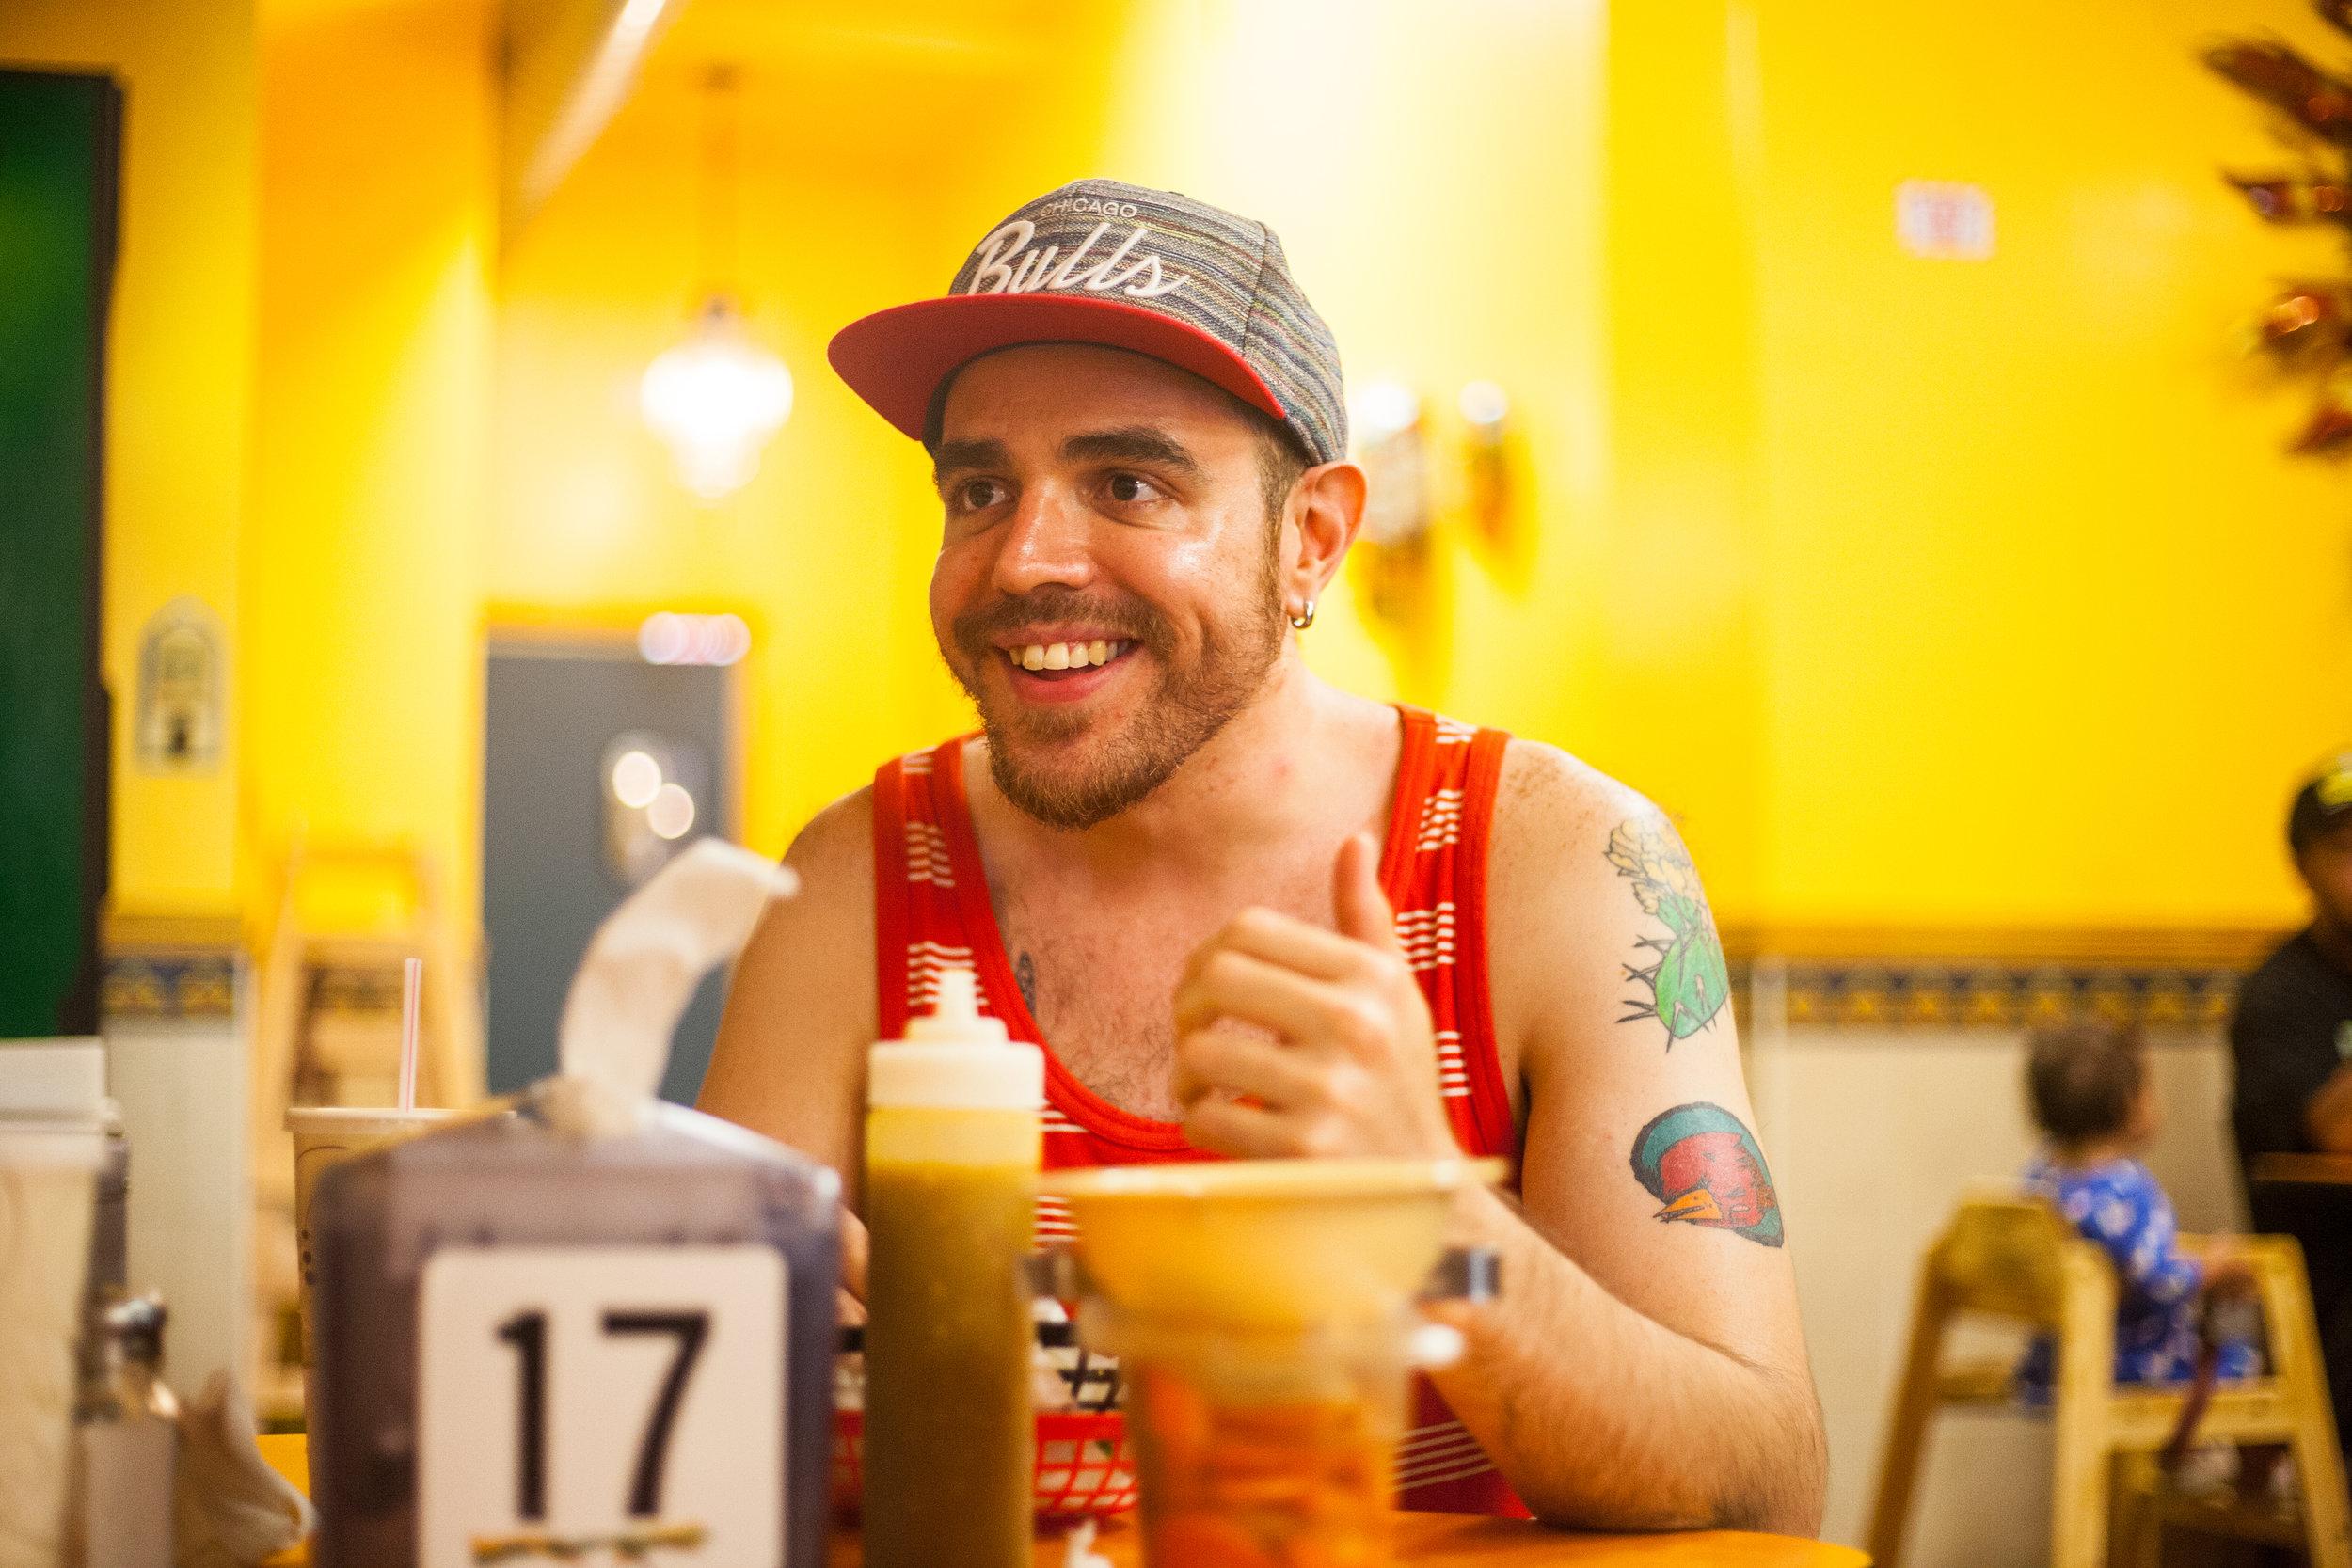 Jose Olivarez for Hooligan-20.jpg